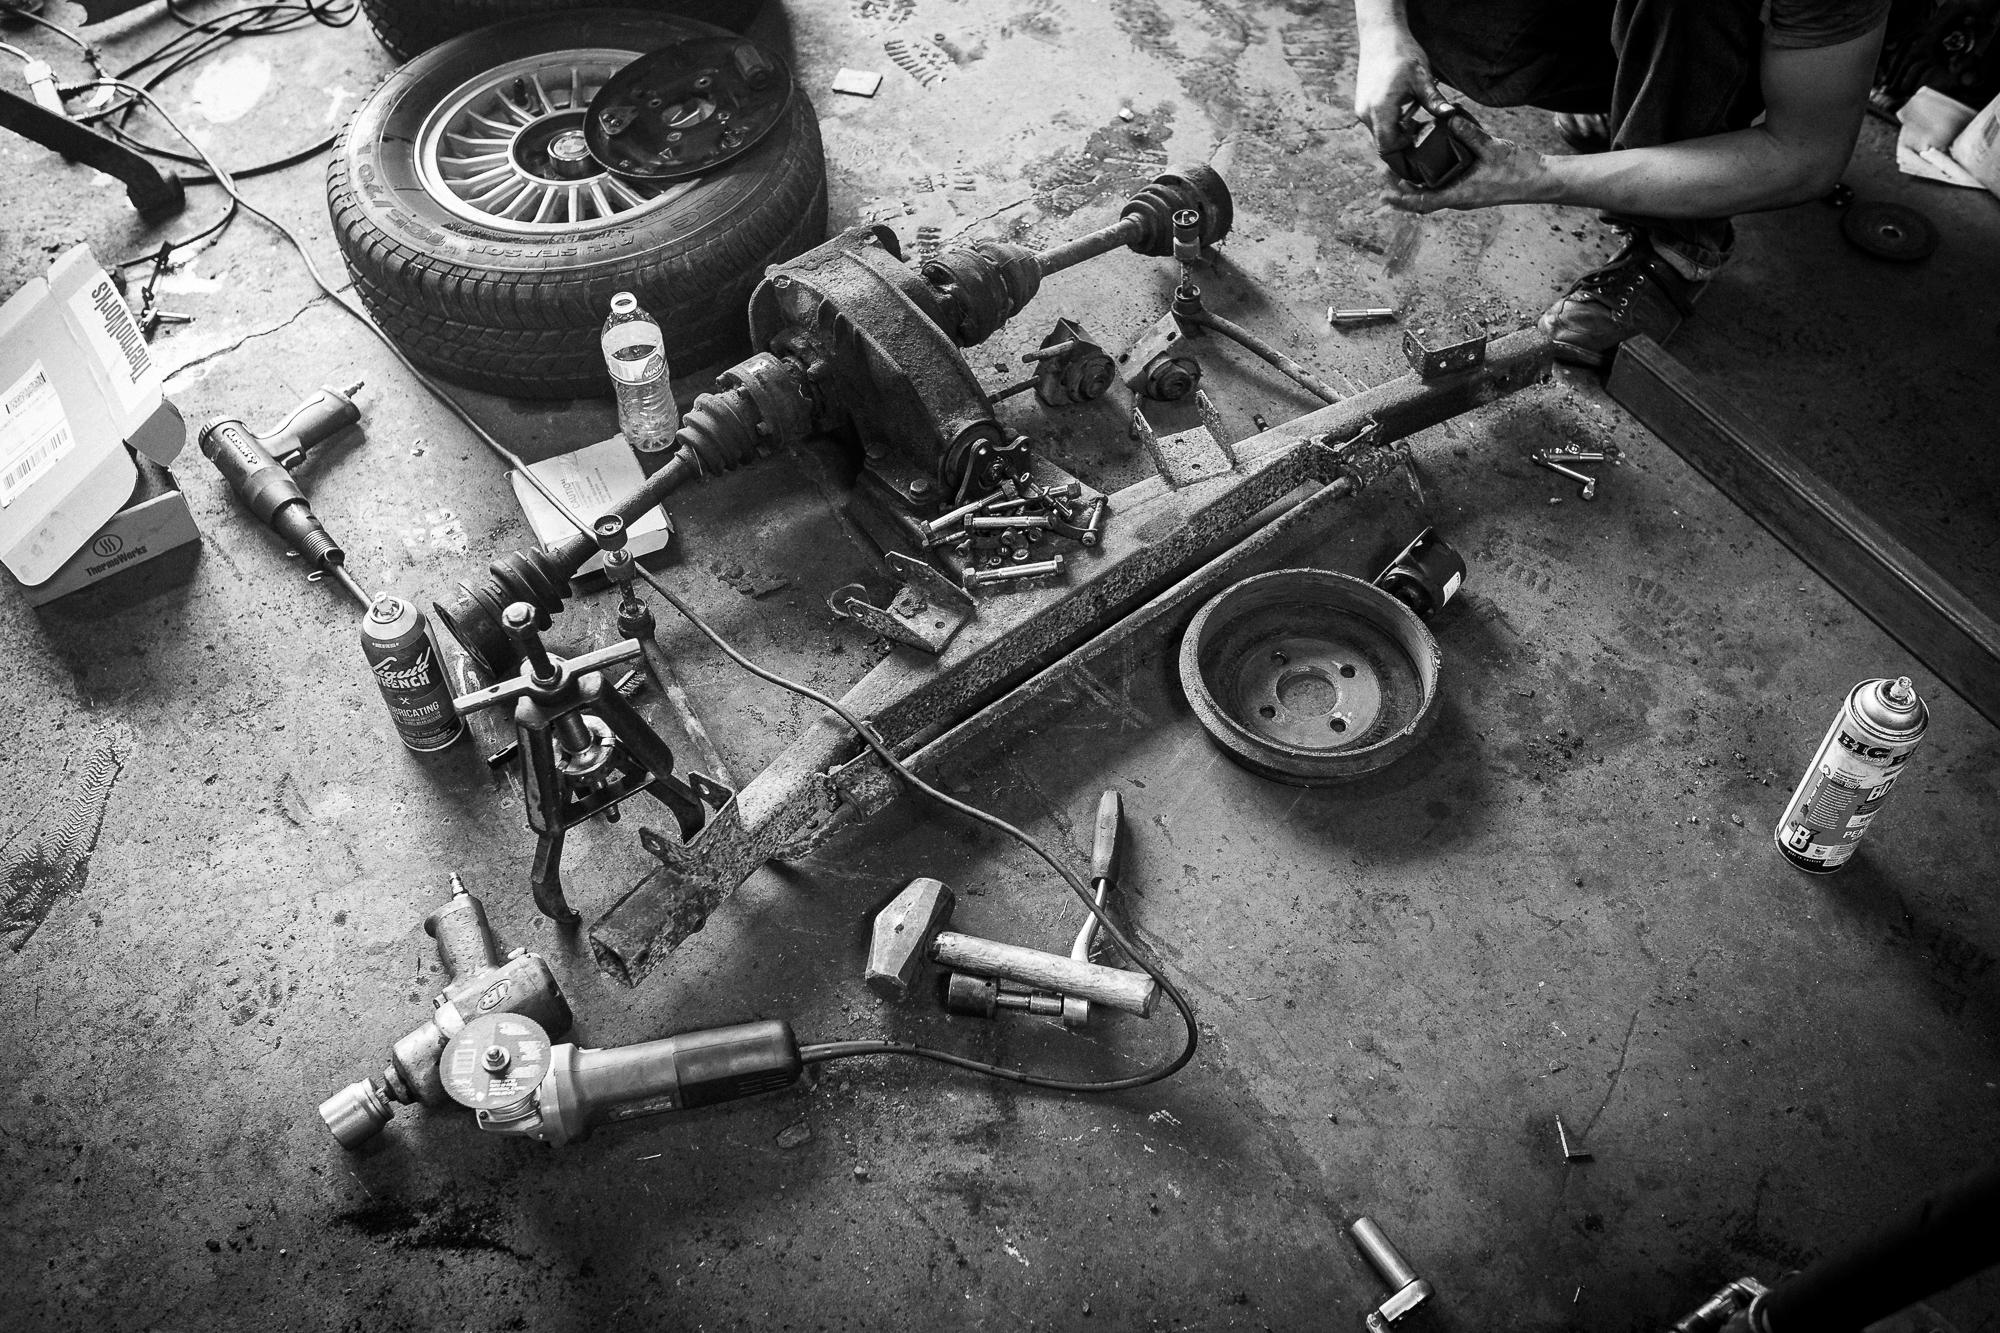 bmw 2002 resto rear end components